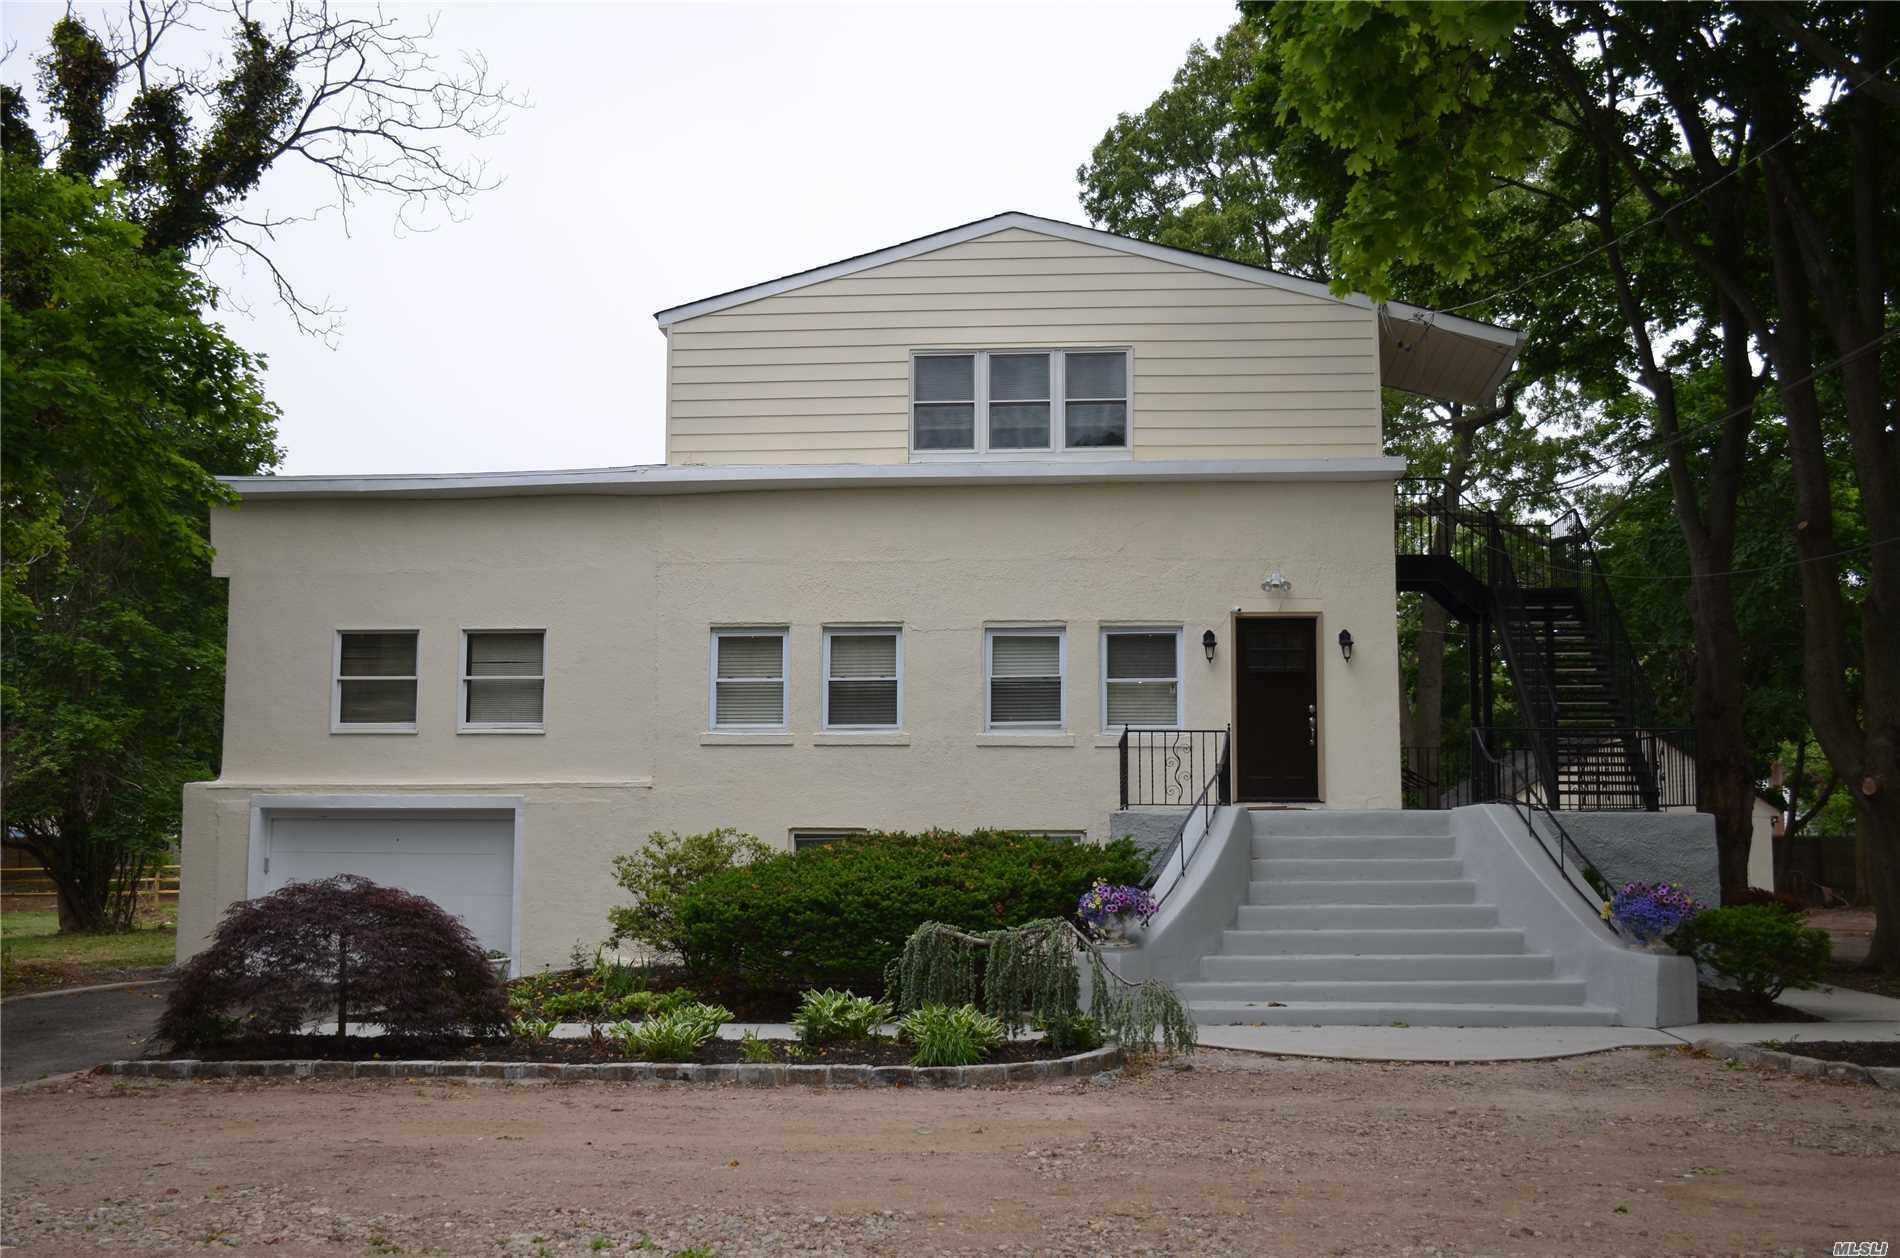 792 Larkfield Rd, 4 - E. Northport, New York